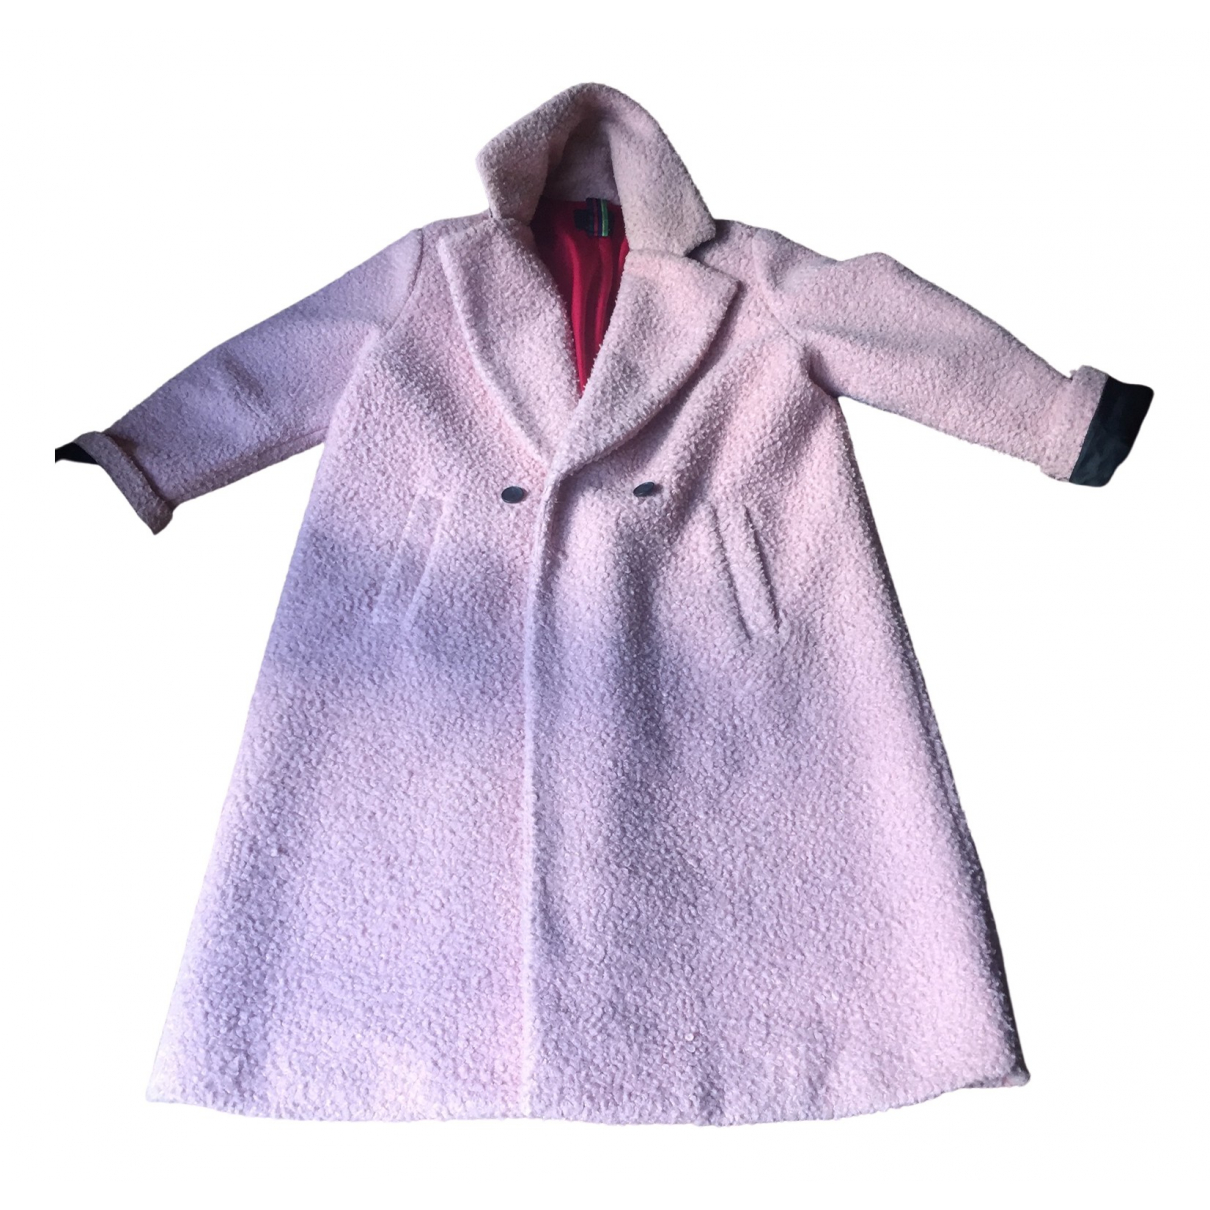 Paul Smith N Pink coat for Women 42 FR